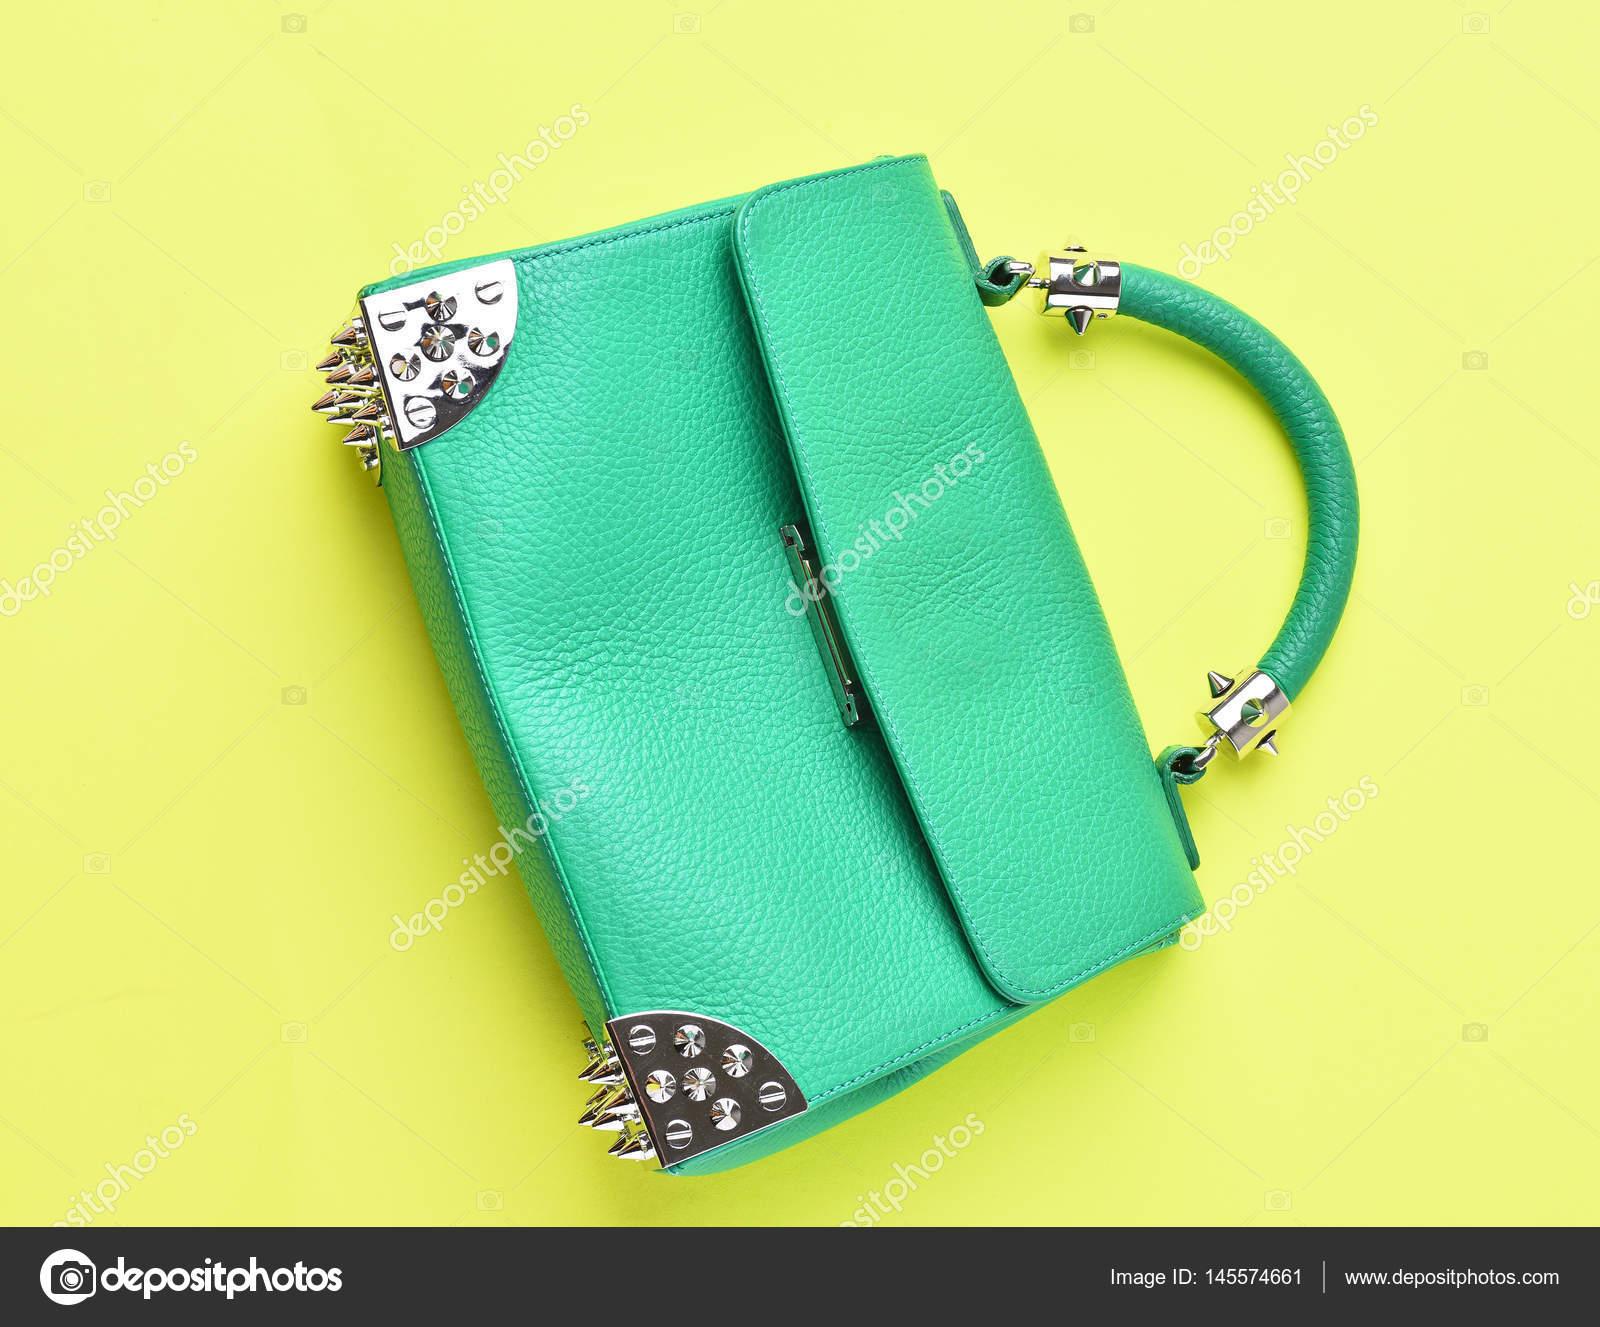 4081e59ba7 Ωραία όμορφη μικρή γυναικεία δερμάτινη πράσινη μοντέρνο τσάντα με διακοσμητικό  μεταλλικό αιχμές ή αγκάθια σε κίτρινο φόντο — Εικόνα από ...